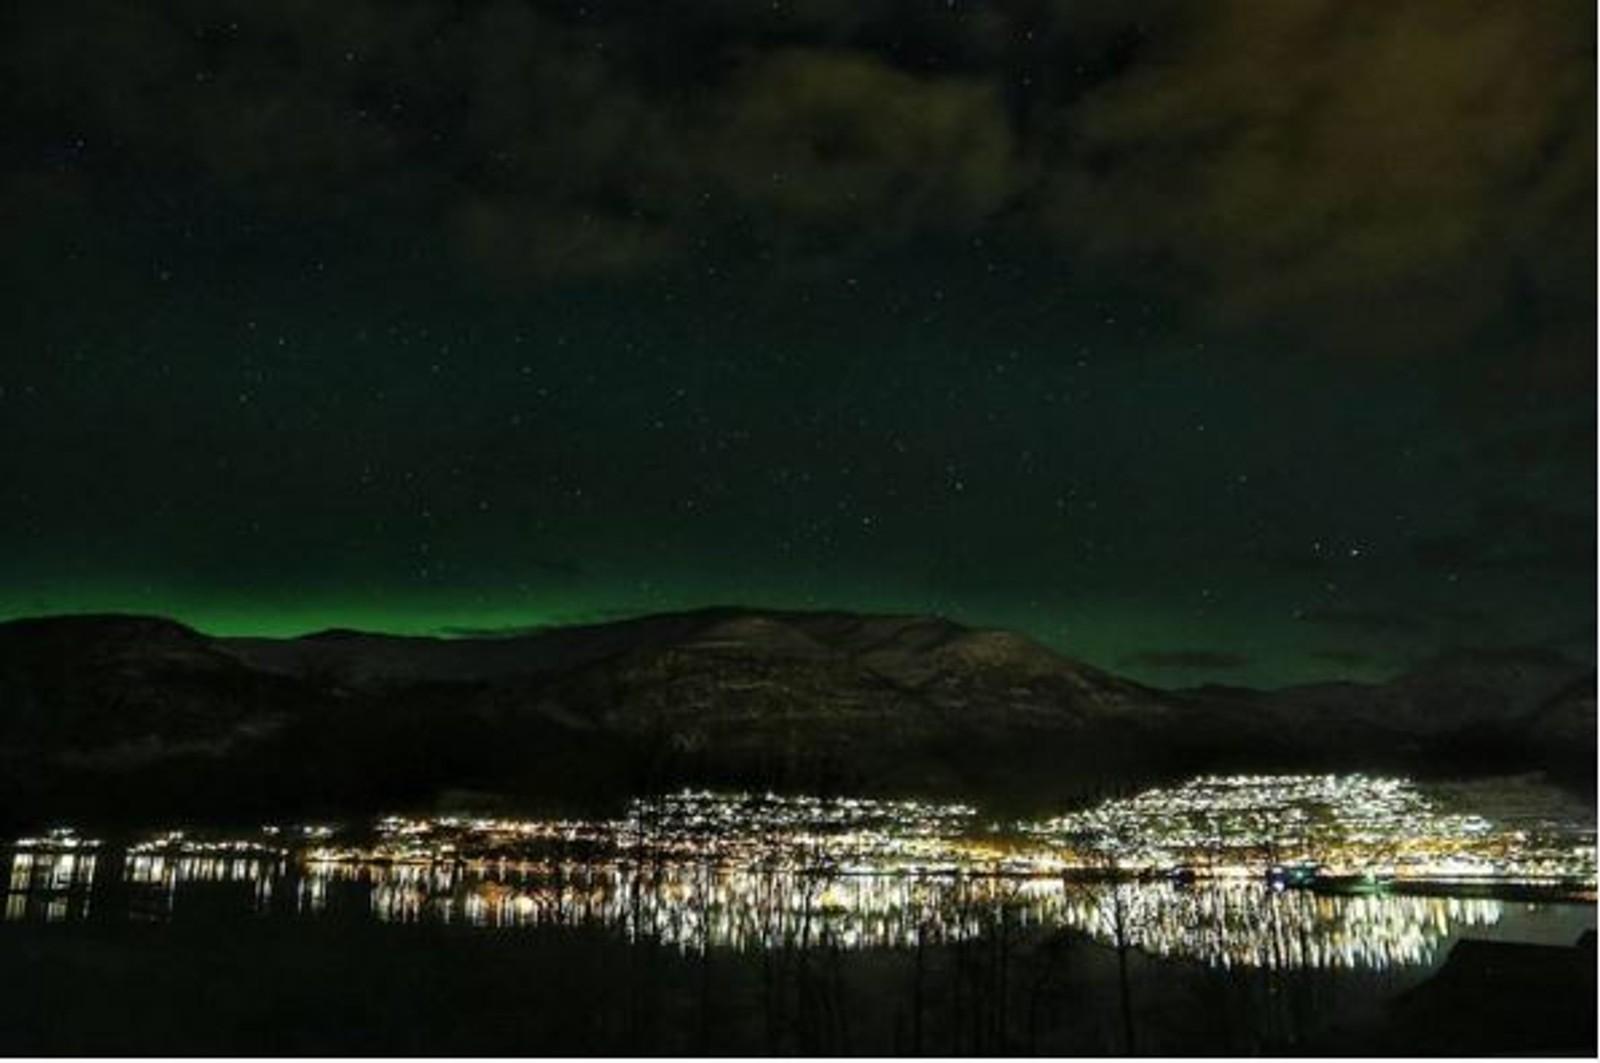 NORDFJORD: Spor av nordlys over Stryn